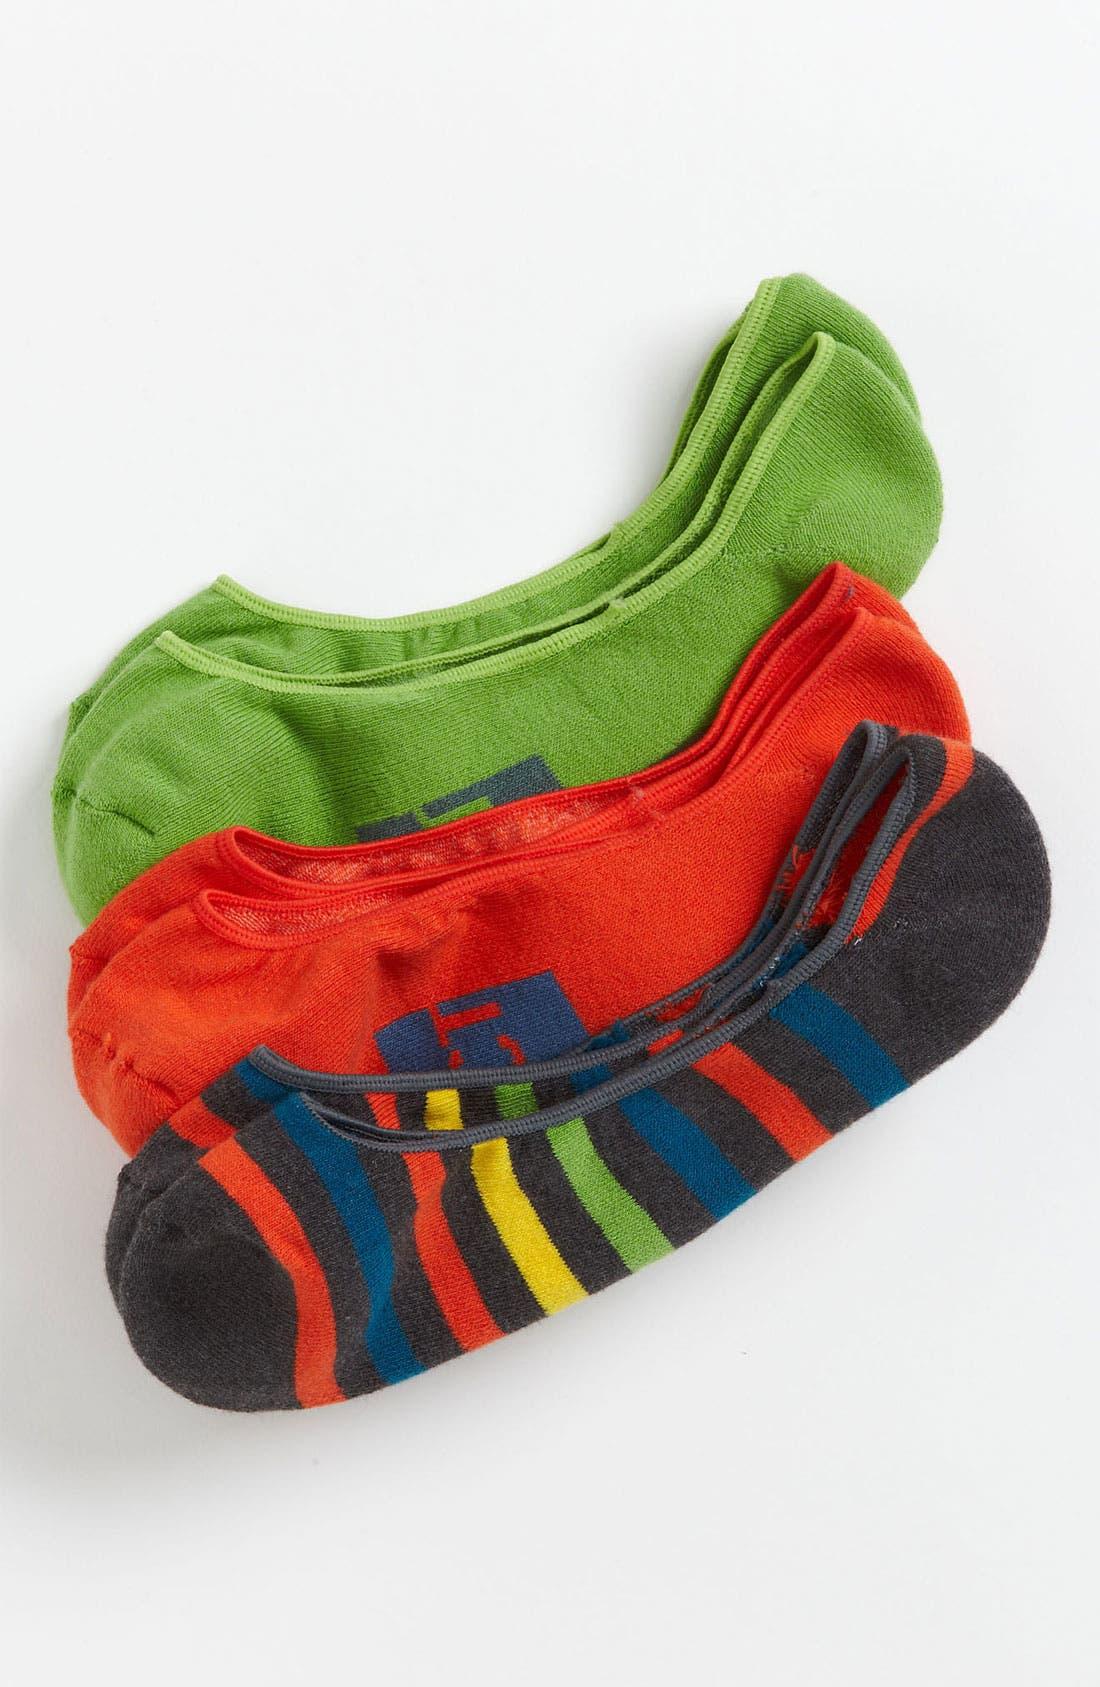 Main Image - Pact 'Farm' No-Show Socks (3-Pack) (Men)